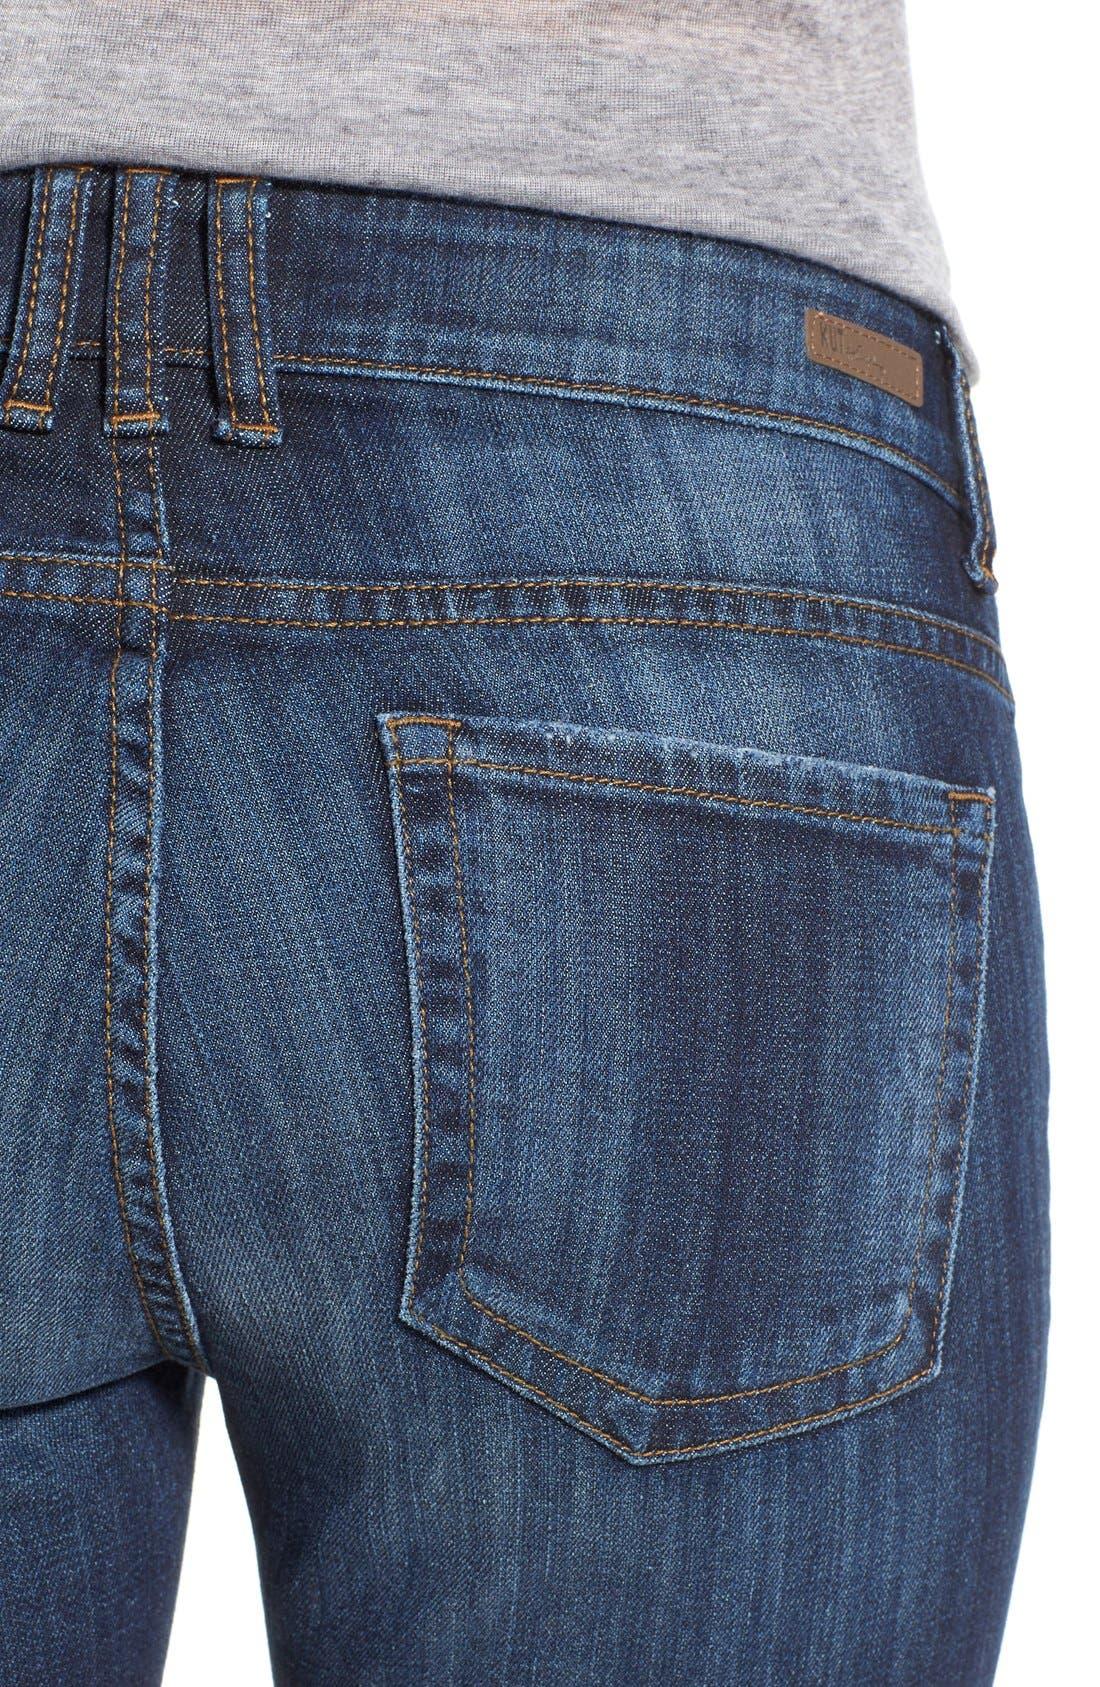 'Catherine' Stretch Boyfriend Jeans,                             Alternate thumbnail 4, color,                             402